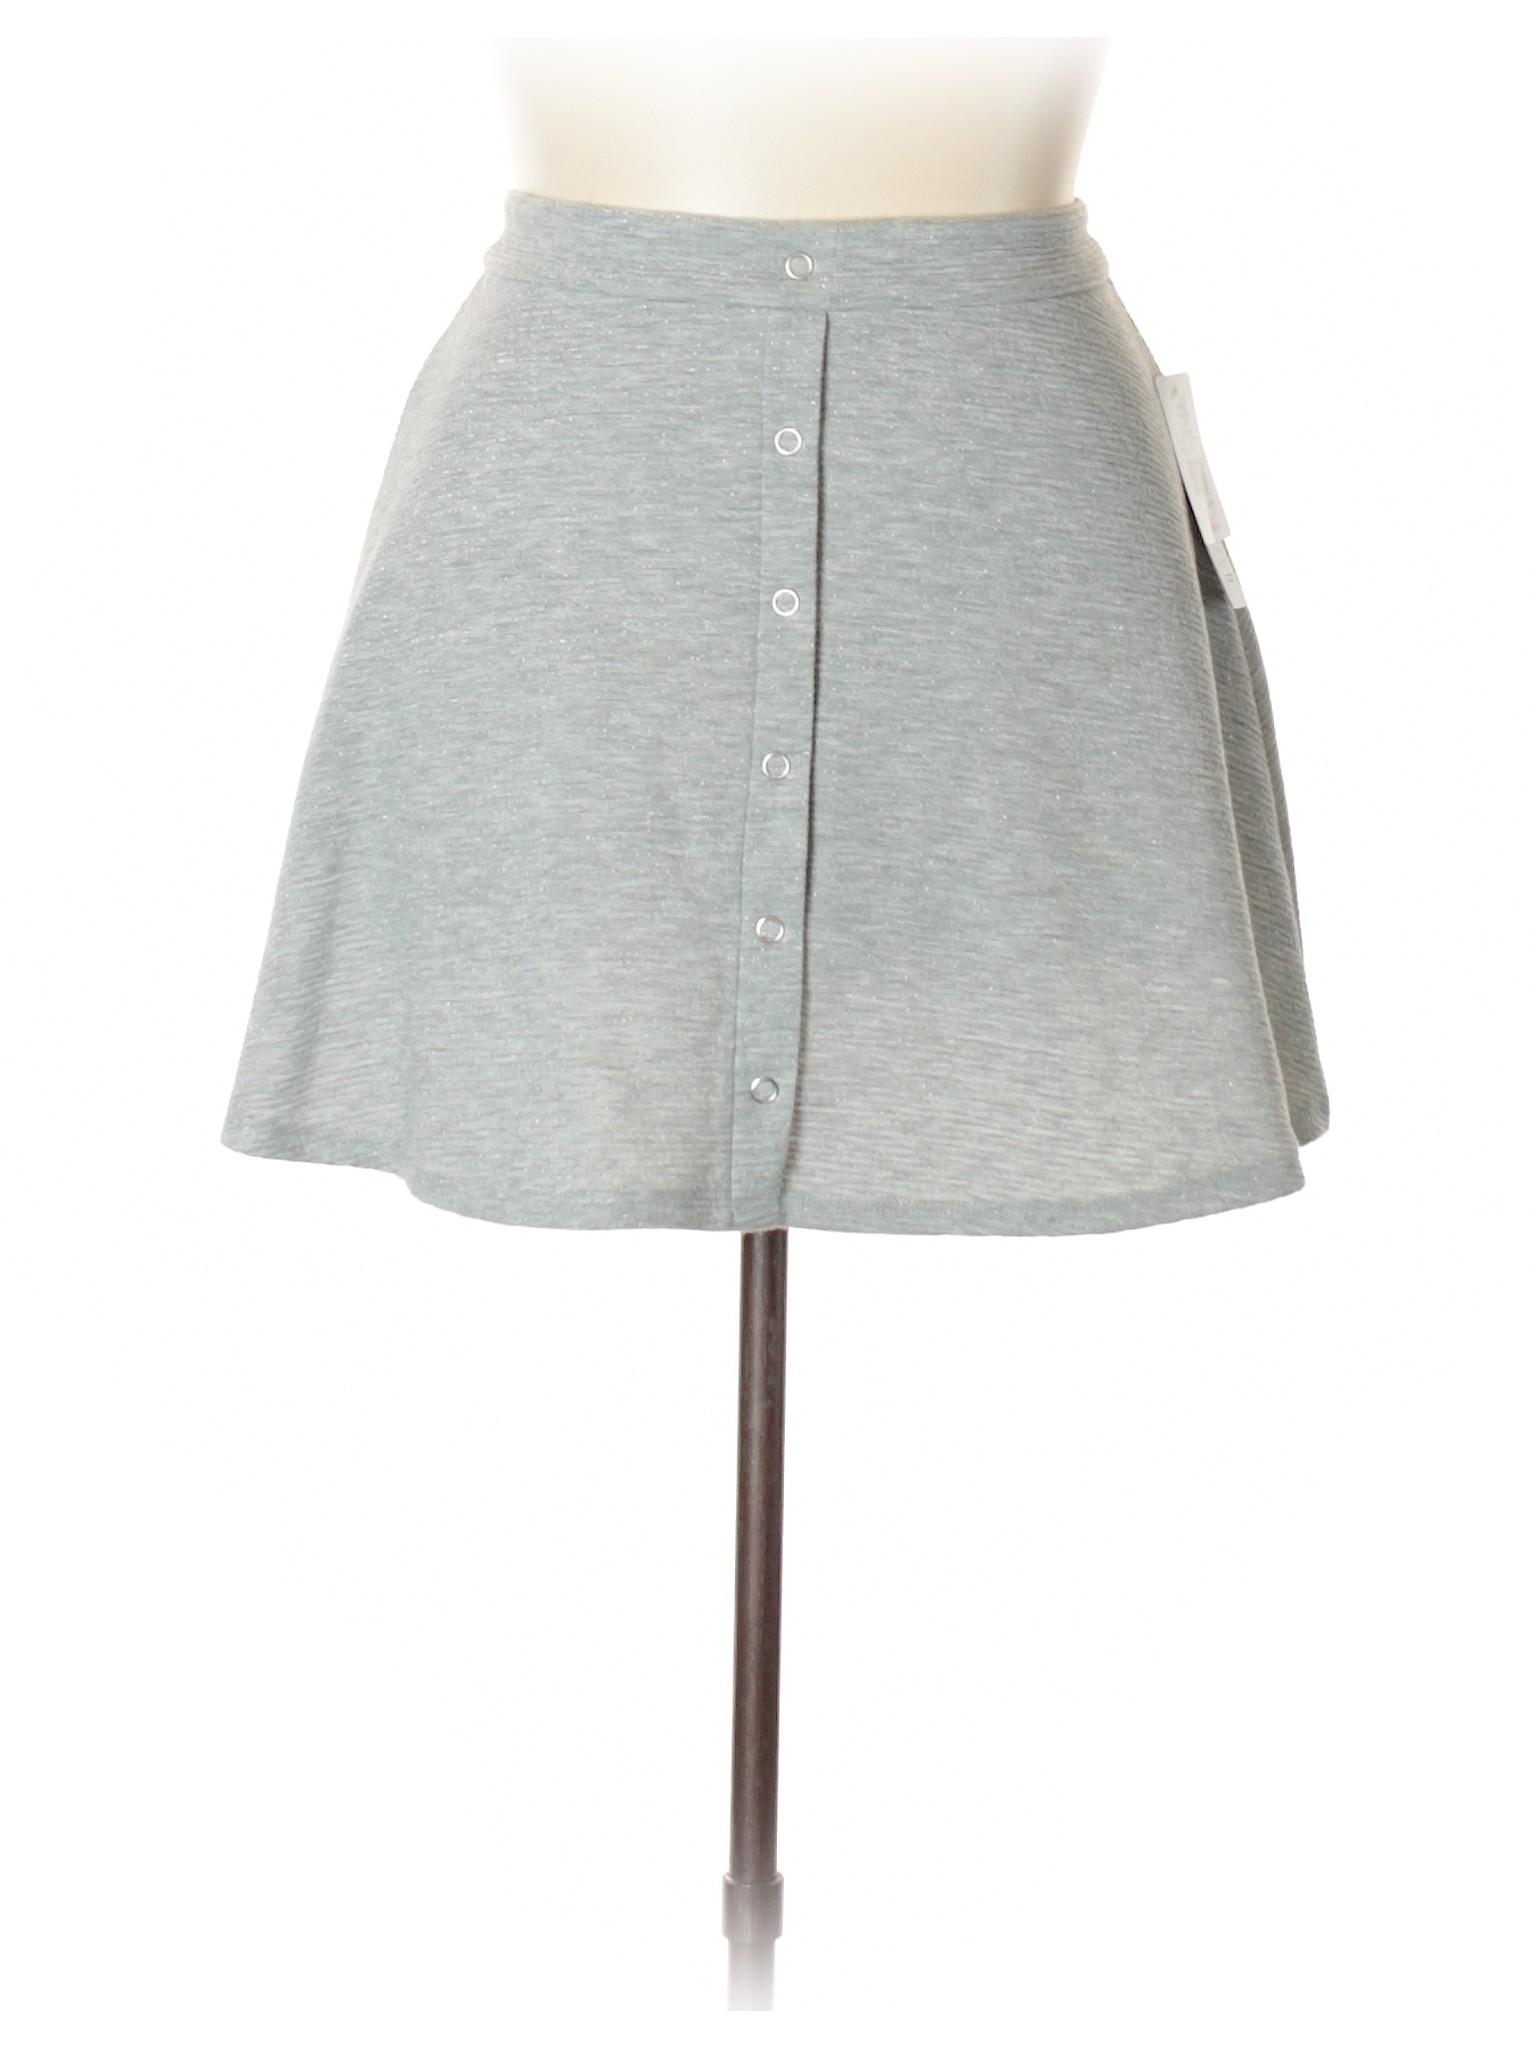 Casual Joe by B Benbasset Joe leisure Skirt Boutique YqBw6P6